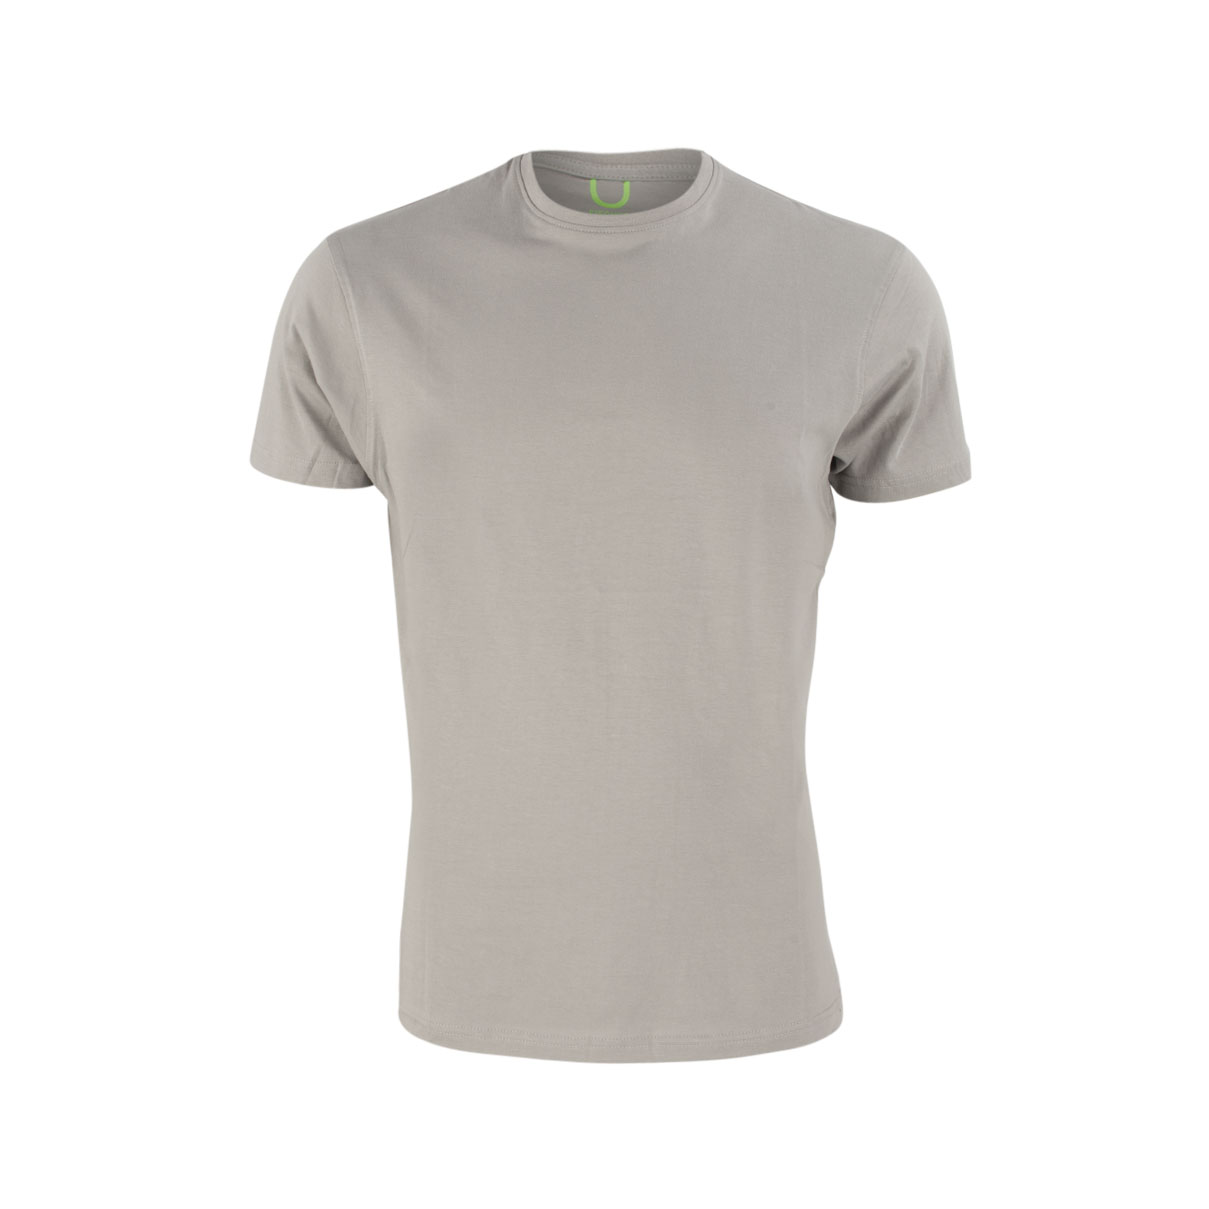 T-Shirt - Regular Fit - Basic